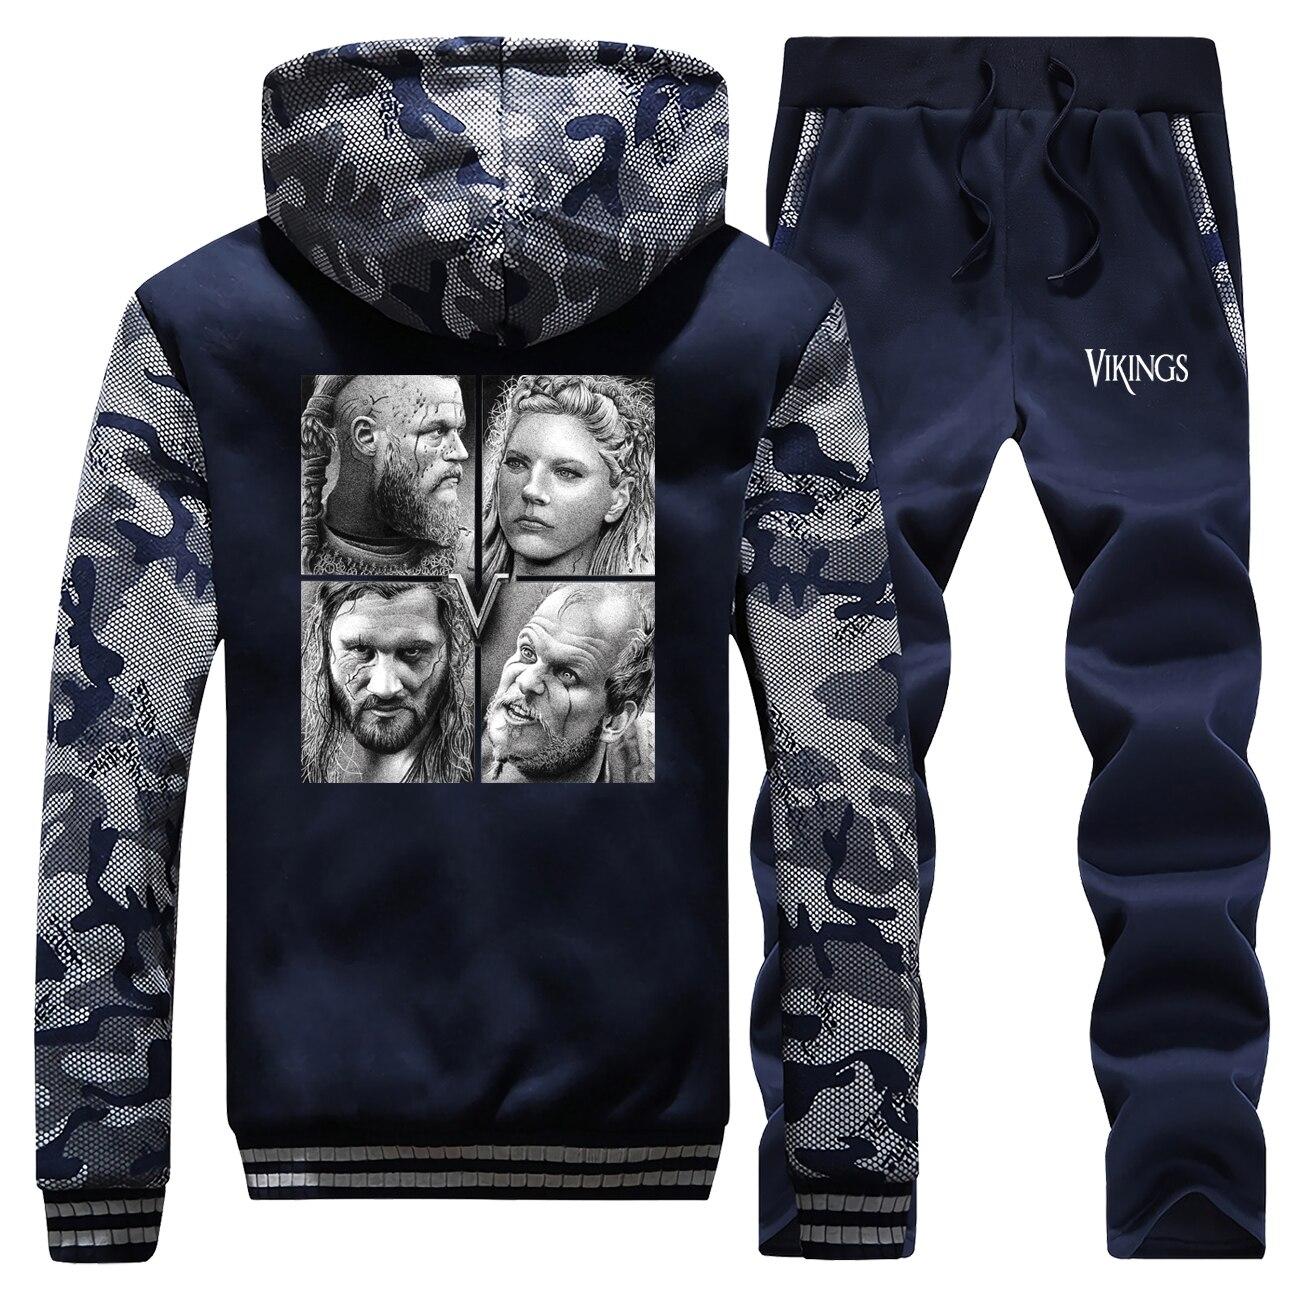 TV Show Viking Men Thick Hoodies Winter Hoodie Sweatshirt Zip Jacket+Pants 2 Piece Sets Warm Suit Hip Hop Brand Men's Tracksuit